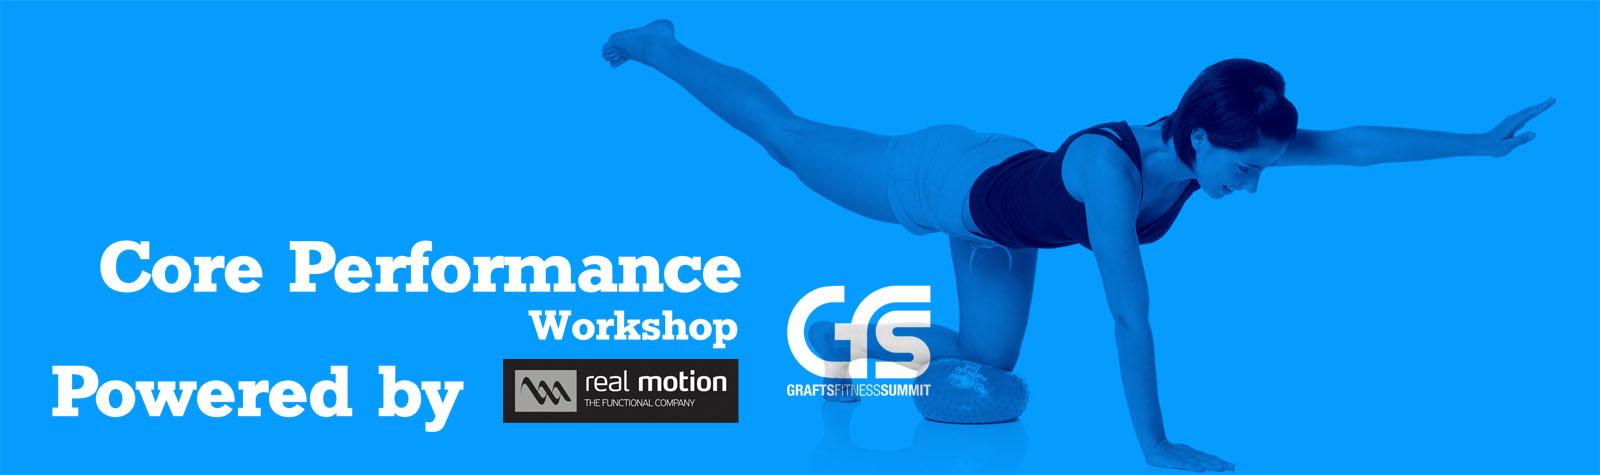 7th GFS 2019 - Group Training Workshop banner